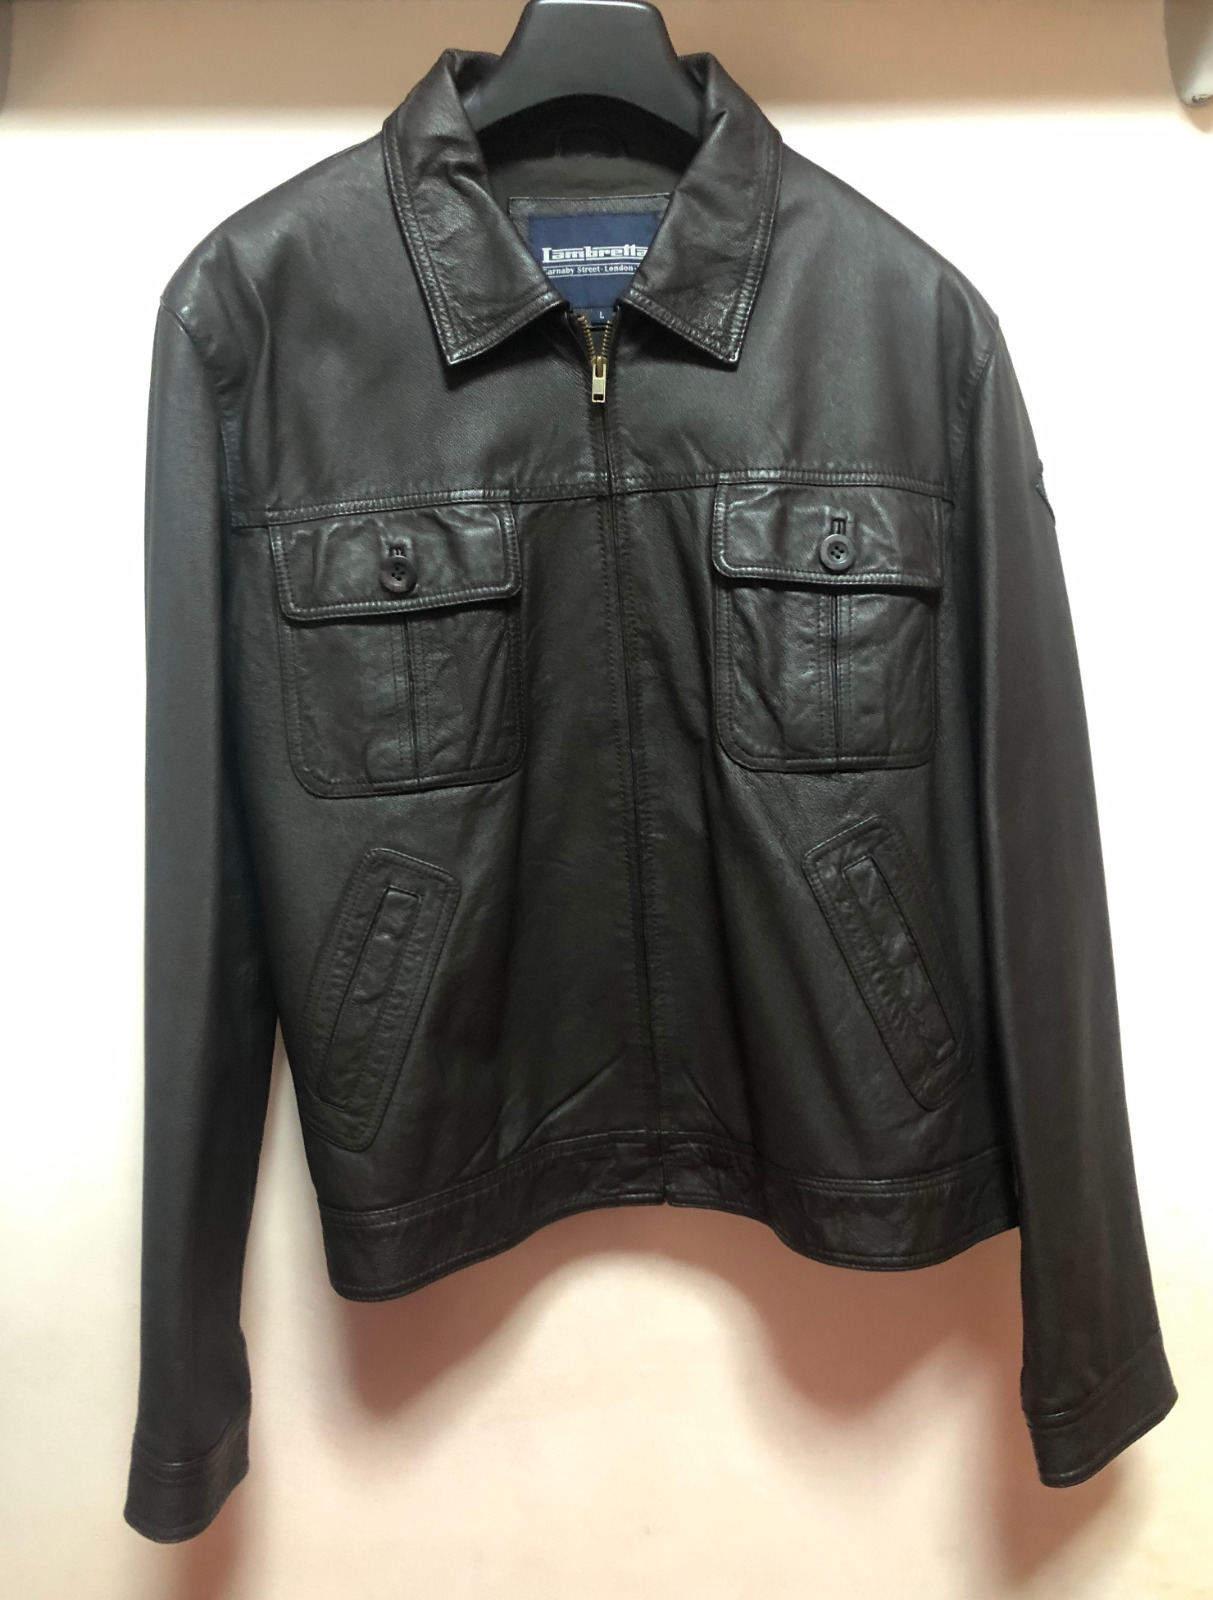 Lambretta Leather Biker Jacket Chaqueta Cazadora Cuero Moto